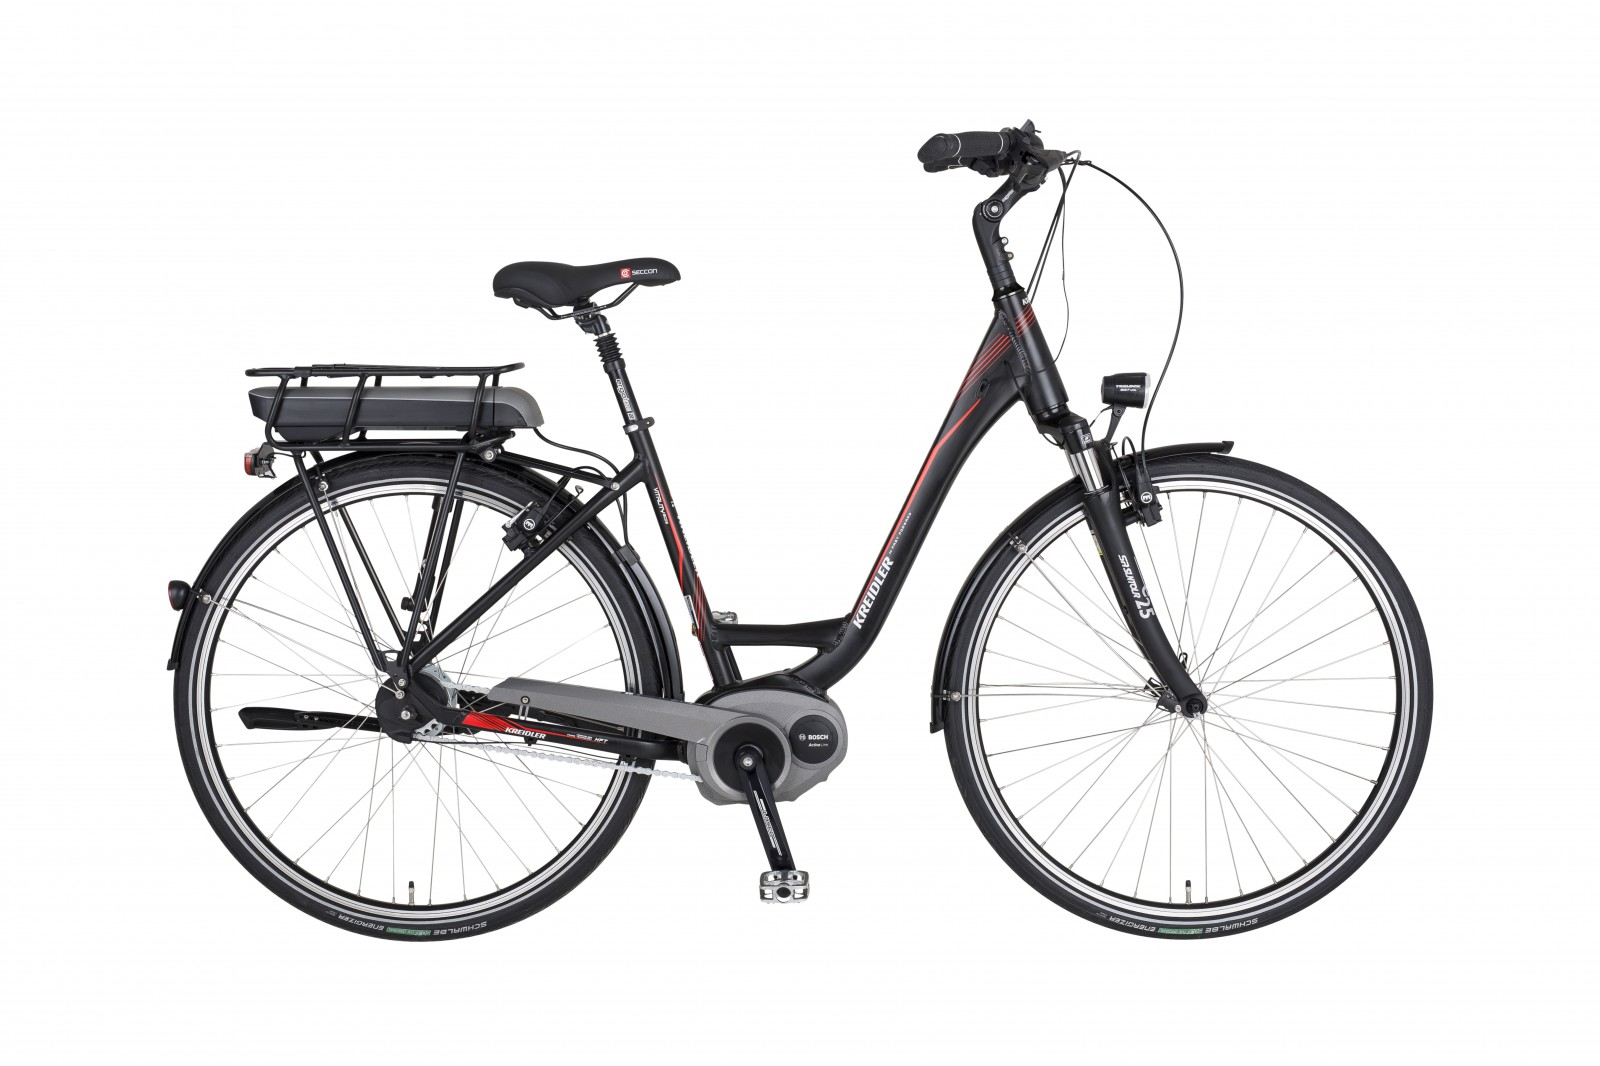 kreidler e bike vitality eco 6 di2 fl wave 28 inch. Black Bedroom Furniture Sets. Home Design Ideas